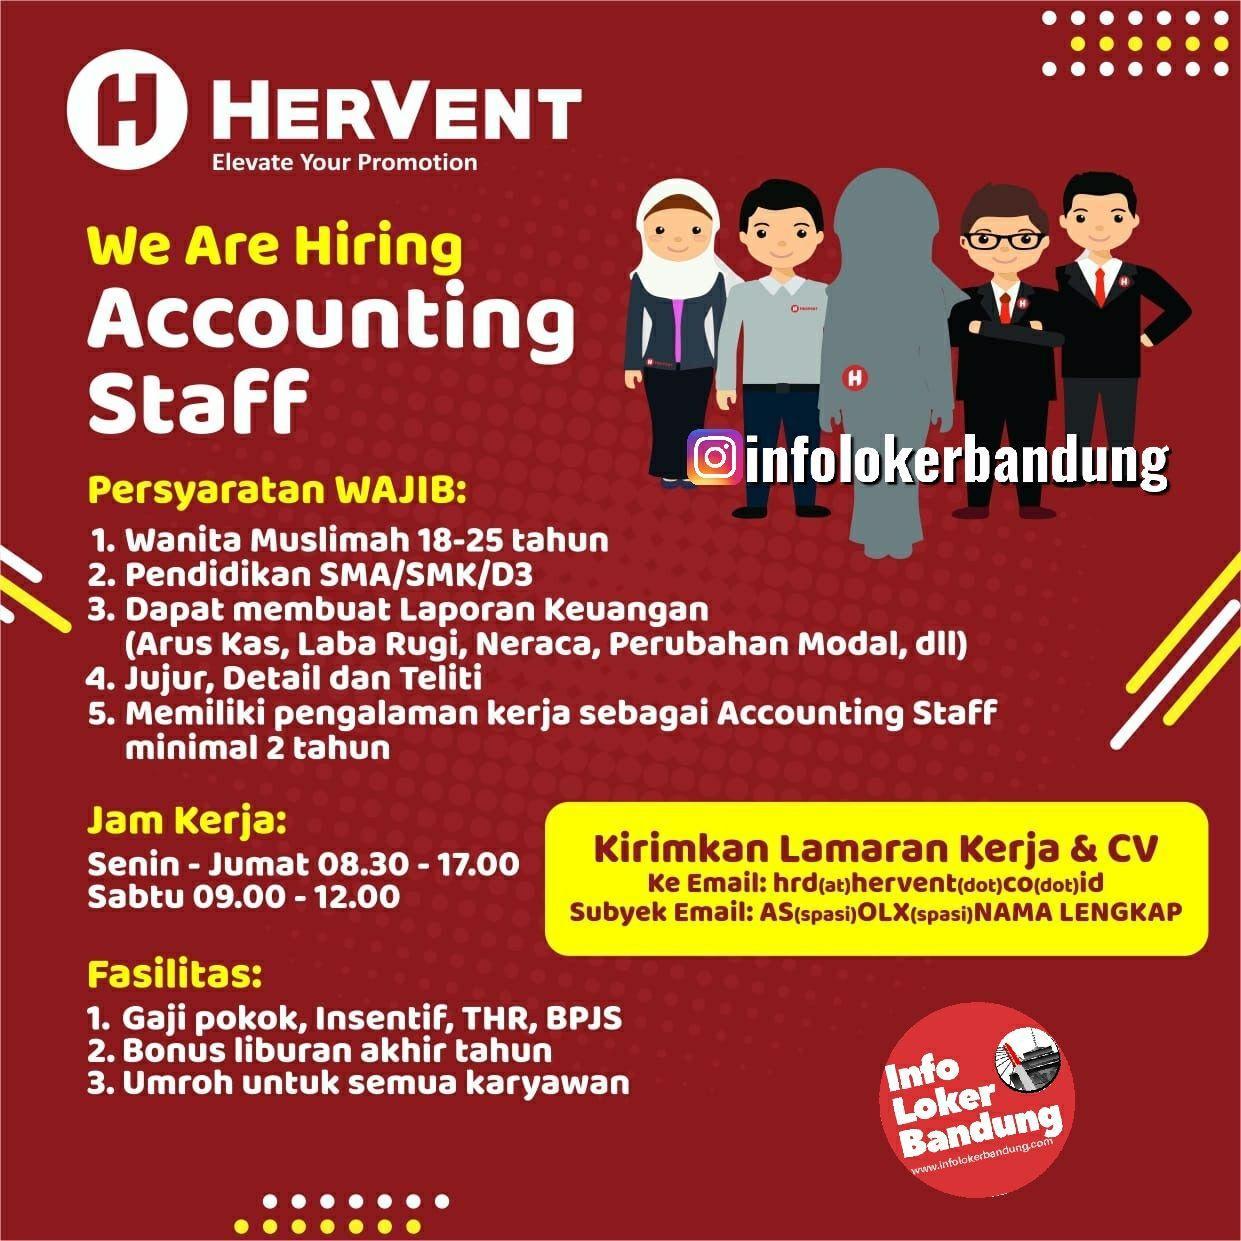 Lowongan Kerja Accounting Staff Hervent Bandung Januari 2020